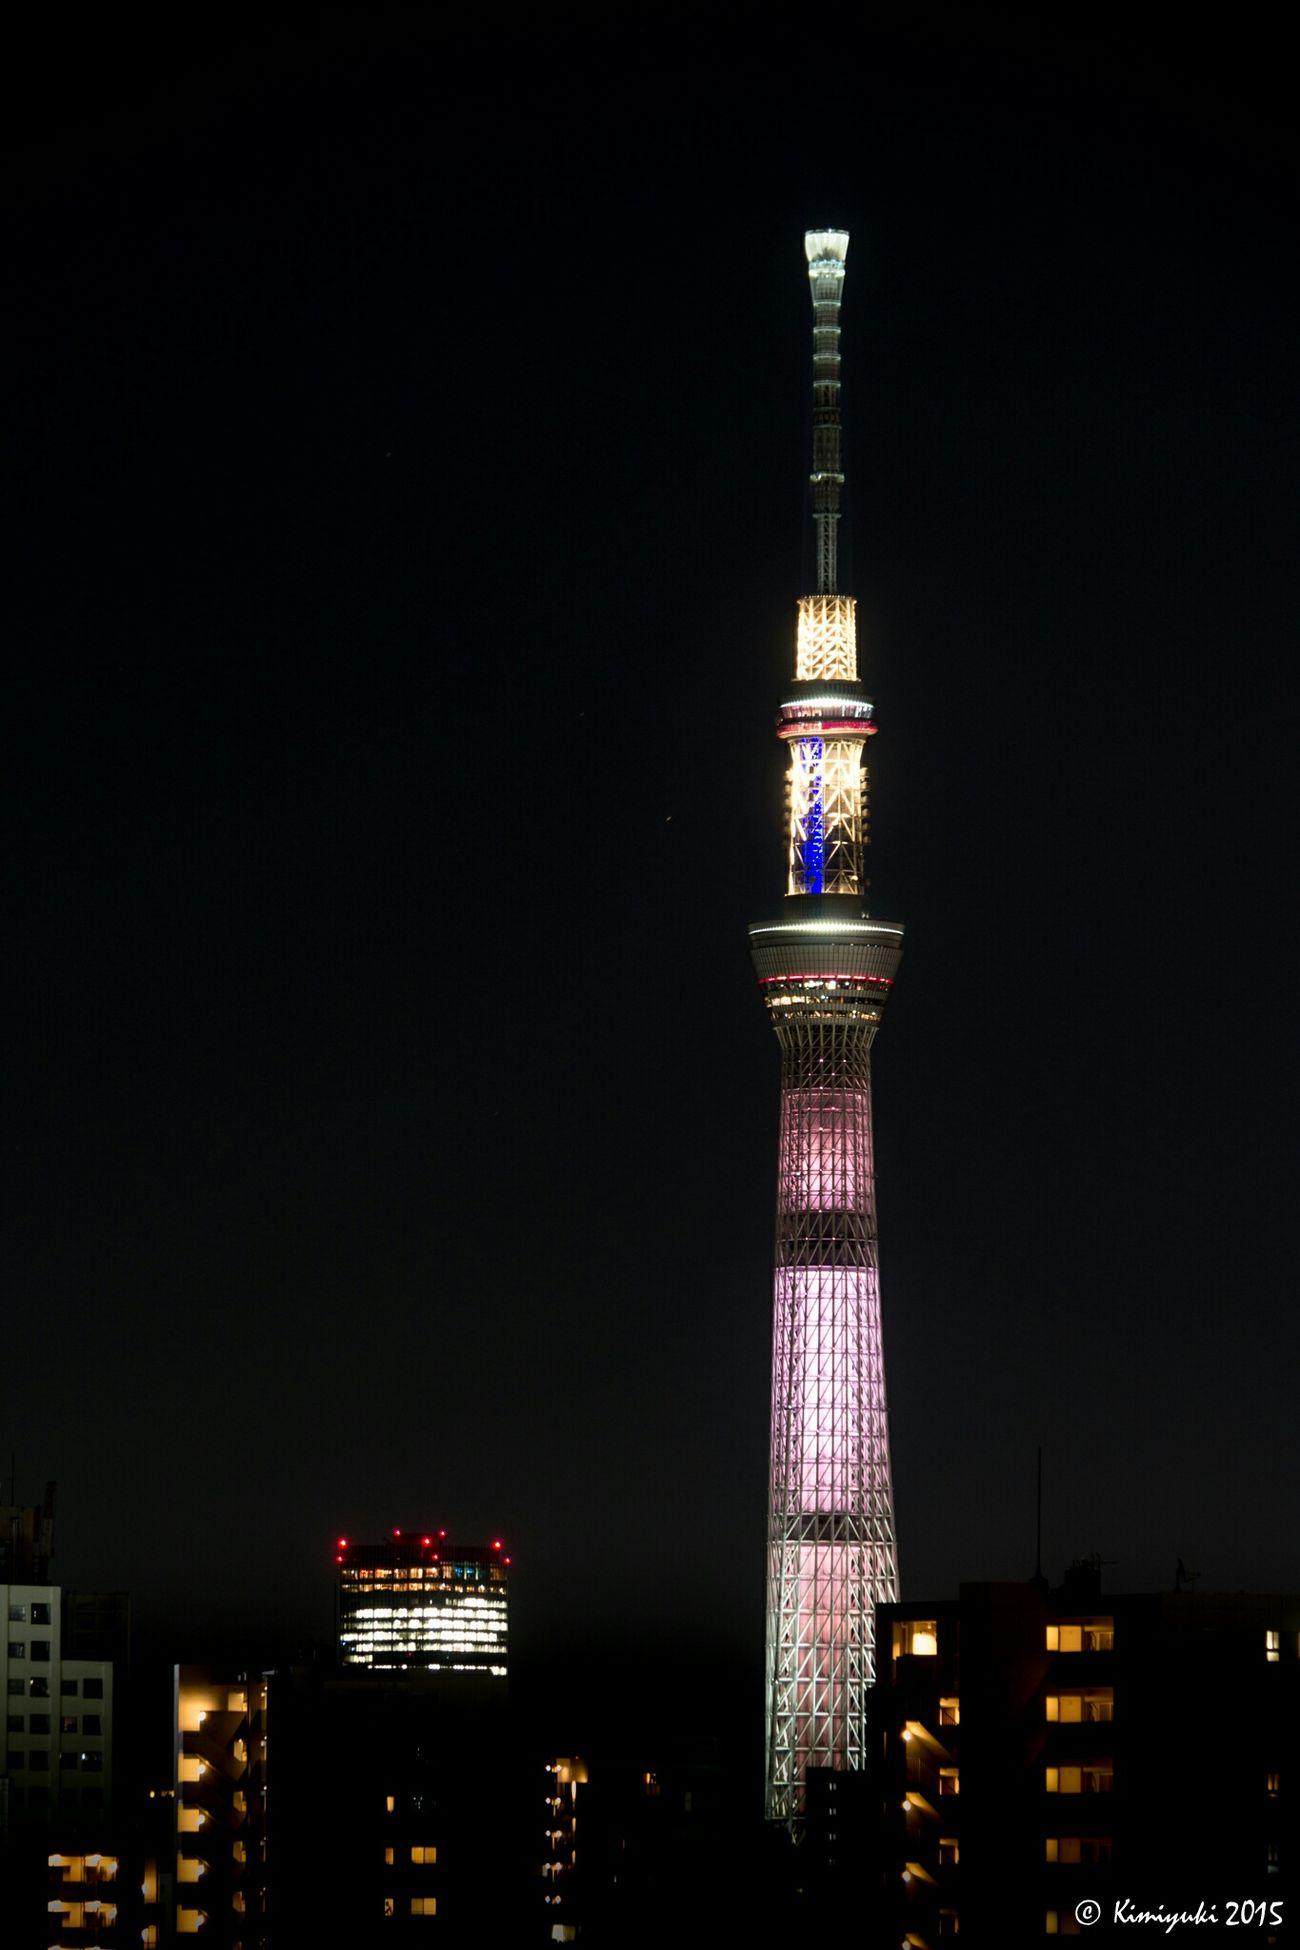 White Chocolat Skytree Tokyoskytree Tower Olympus Om-d E-m10 Nightphotography Lightup 鉄塔♡Love